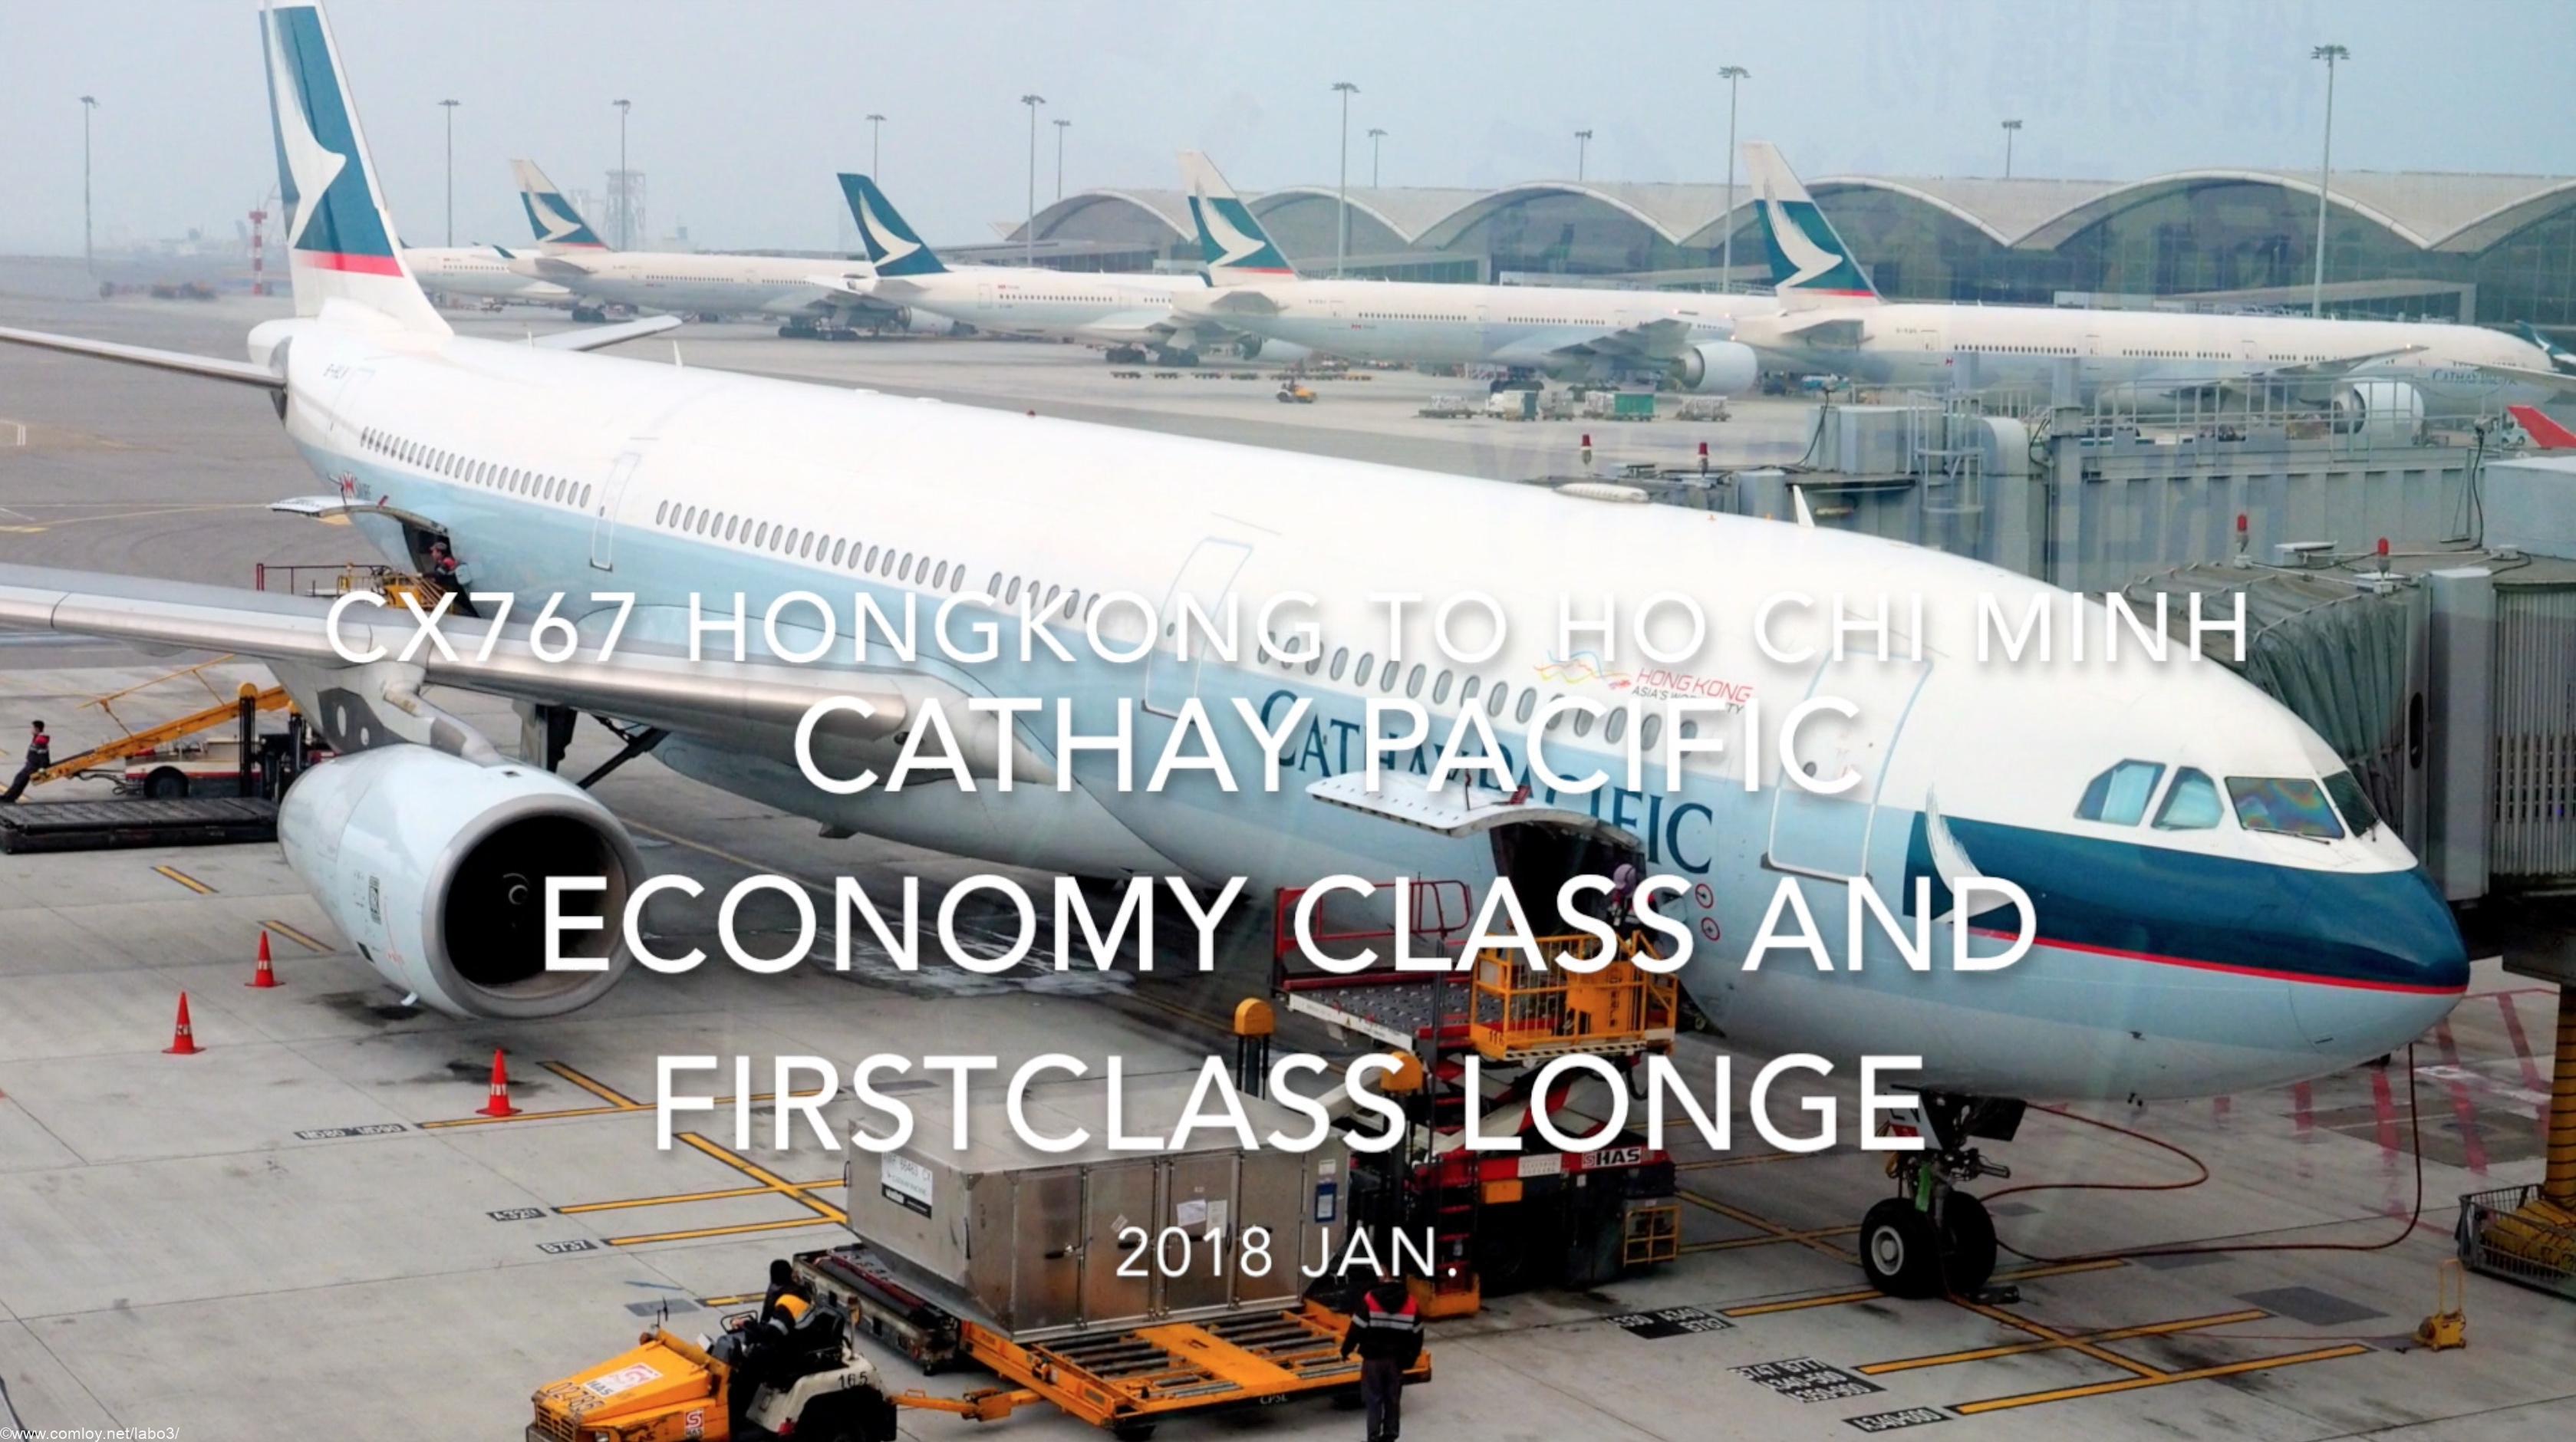 【Flight Report】 CX767 Hongkong to Ho Chi Minh and Firstclass Longe 2018・1 キャセイパシフィック 香港 - ホーチミン エコノミークラス搭乗記